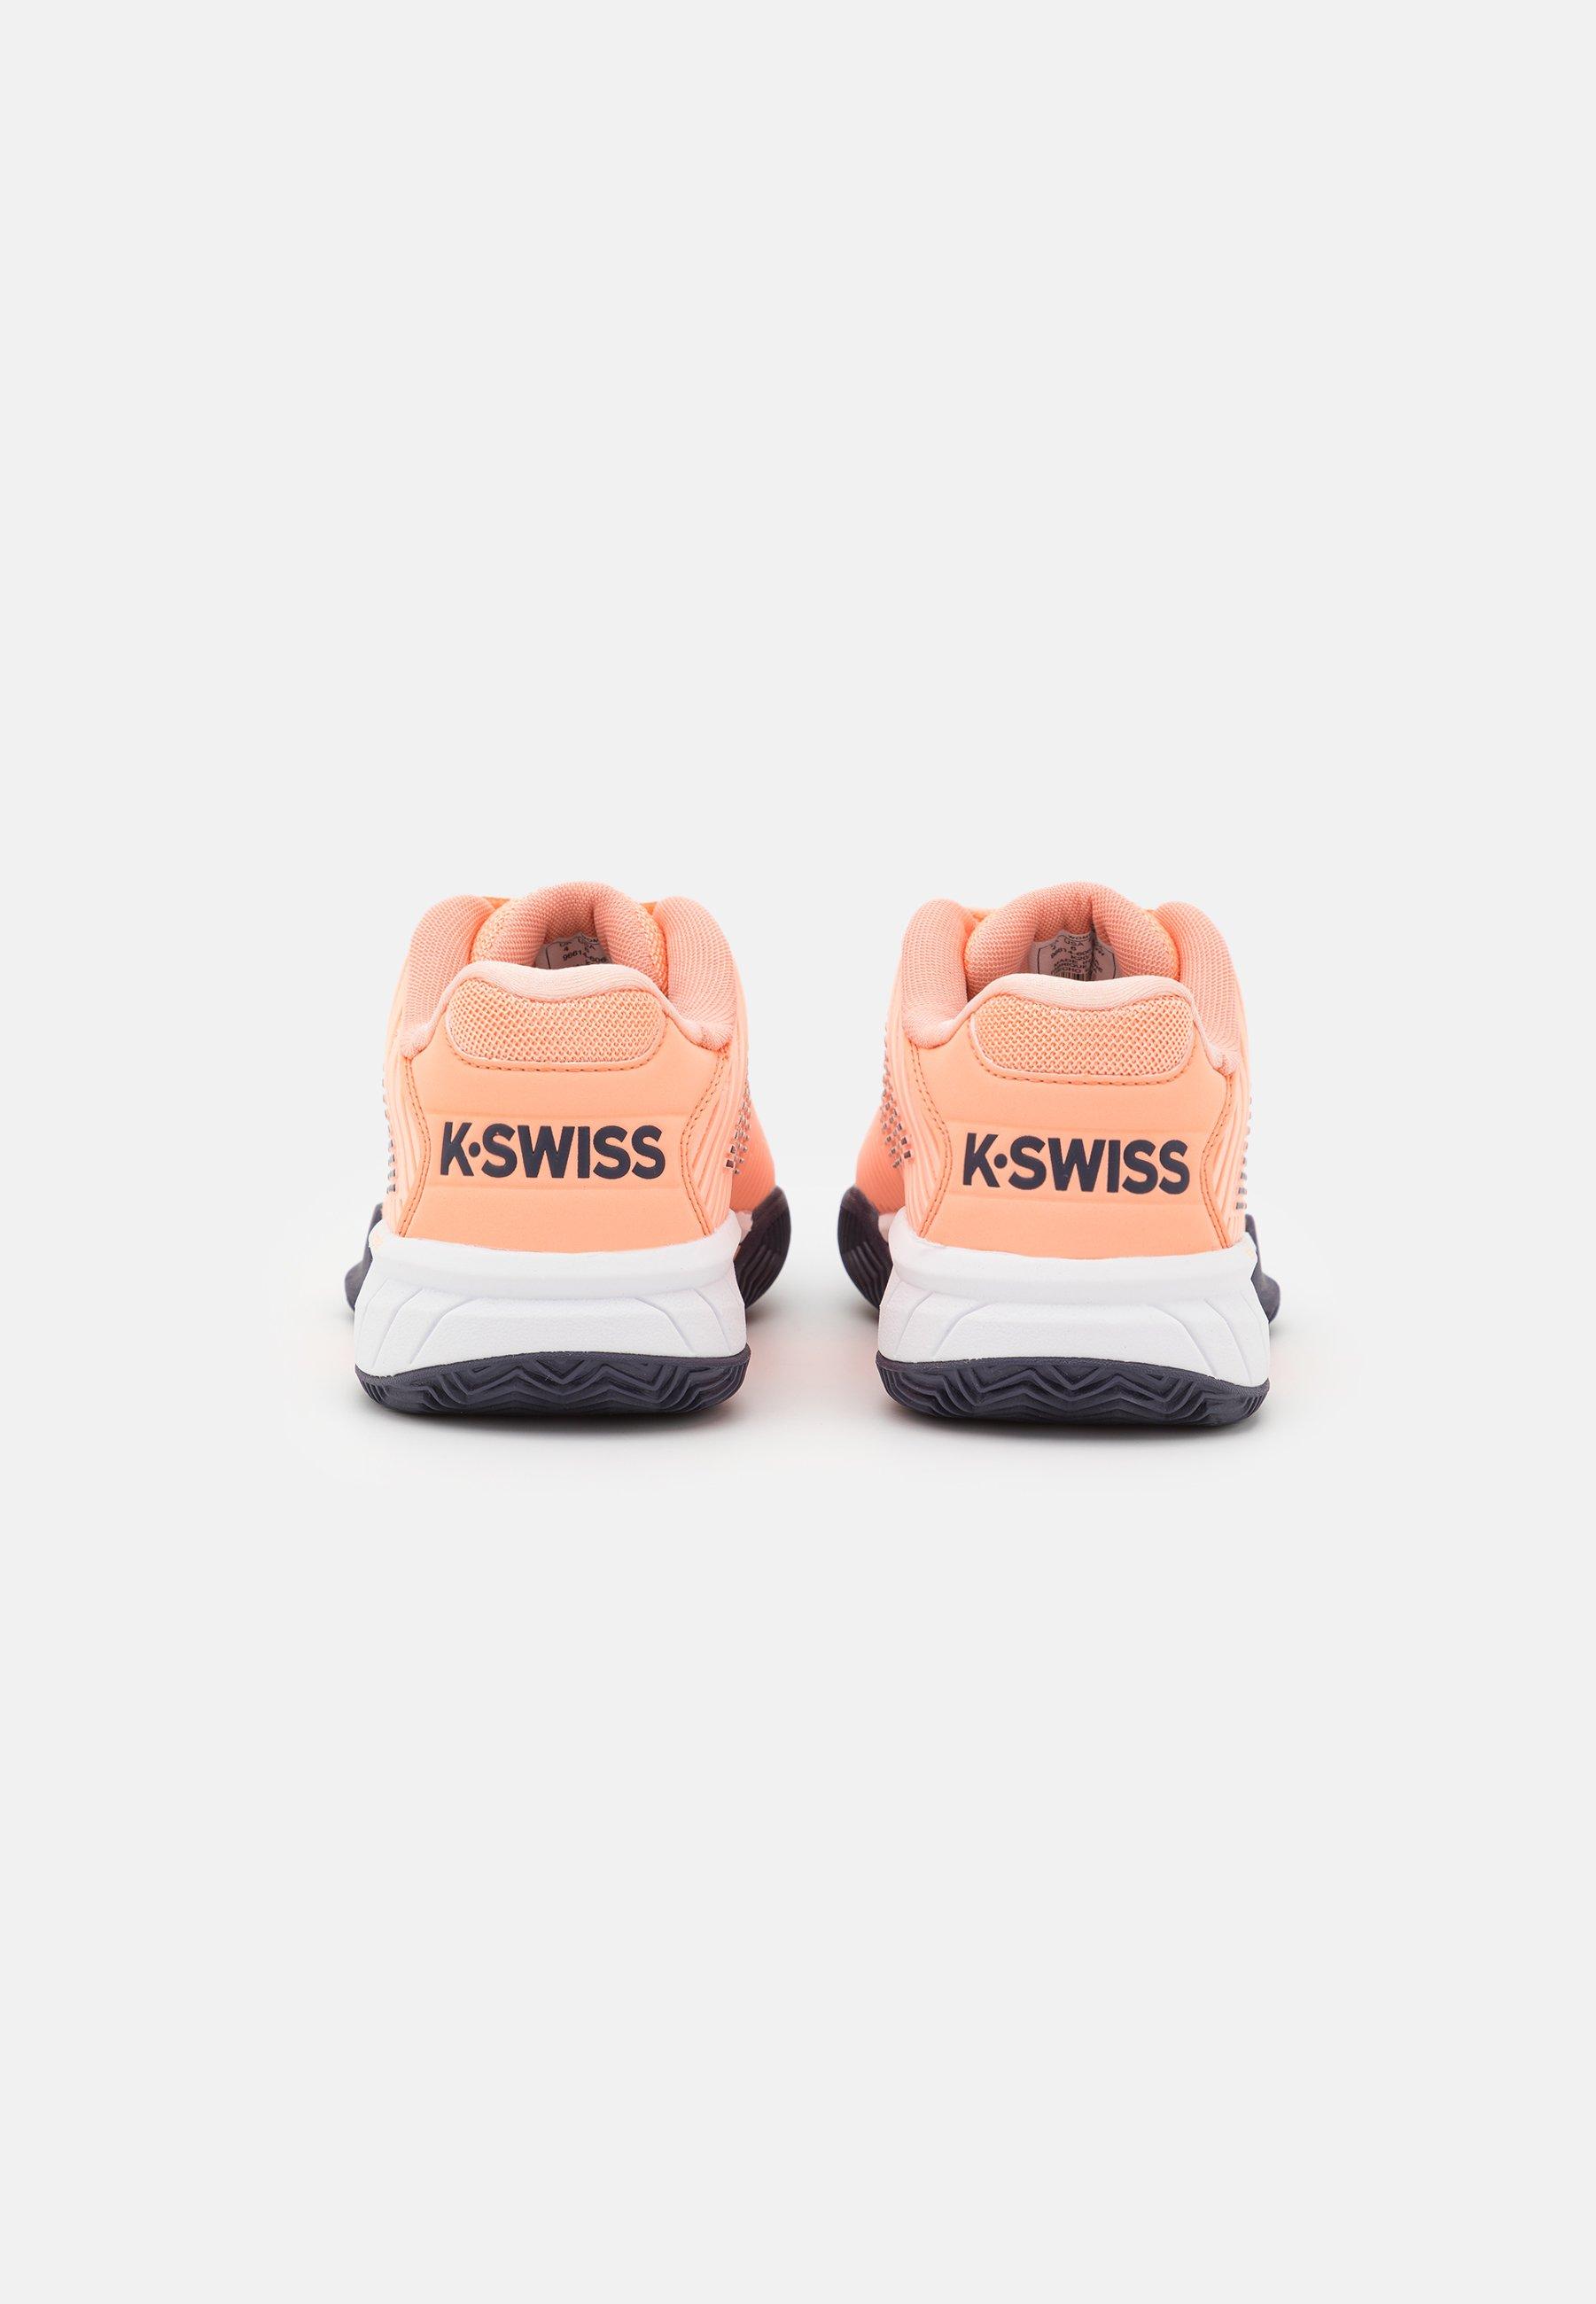 Femme HYPERCOURT EXPRESS 2 HB - Chaussures de tennis toutes surfaces